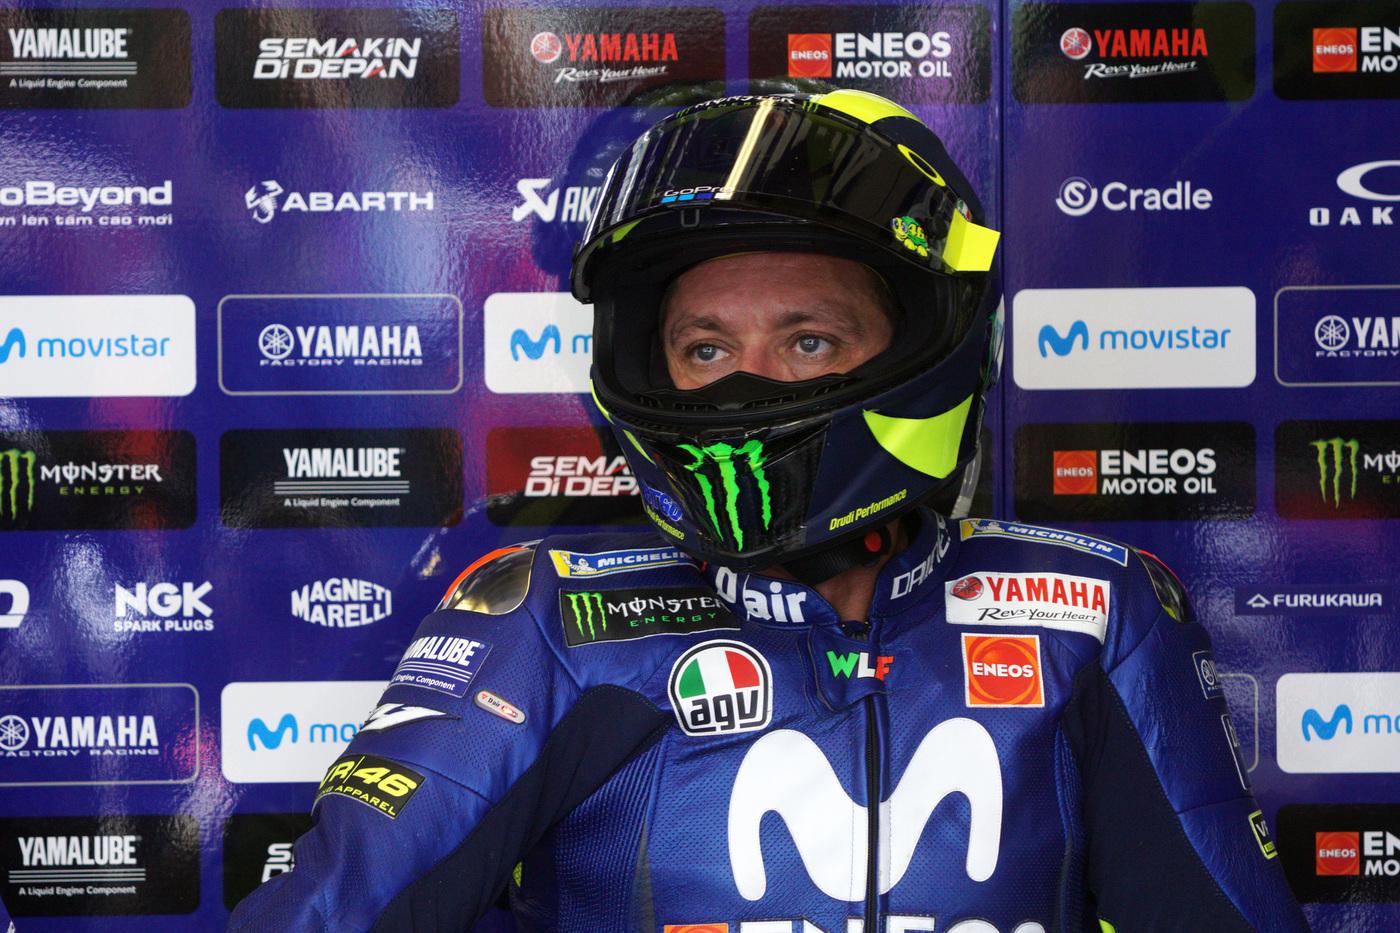 MotoGP, Valentino Rossi cosa succede in Yamaha?